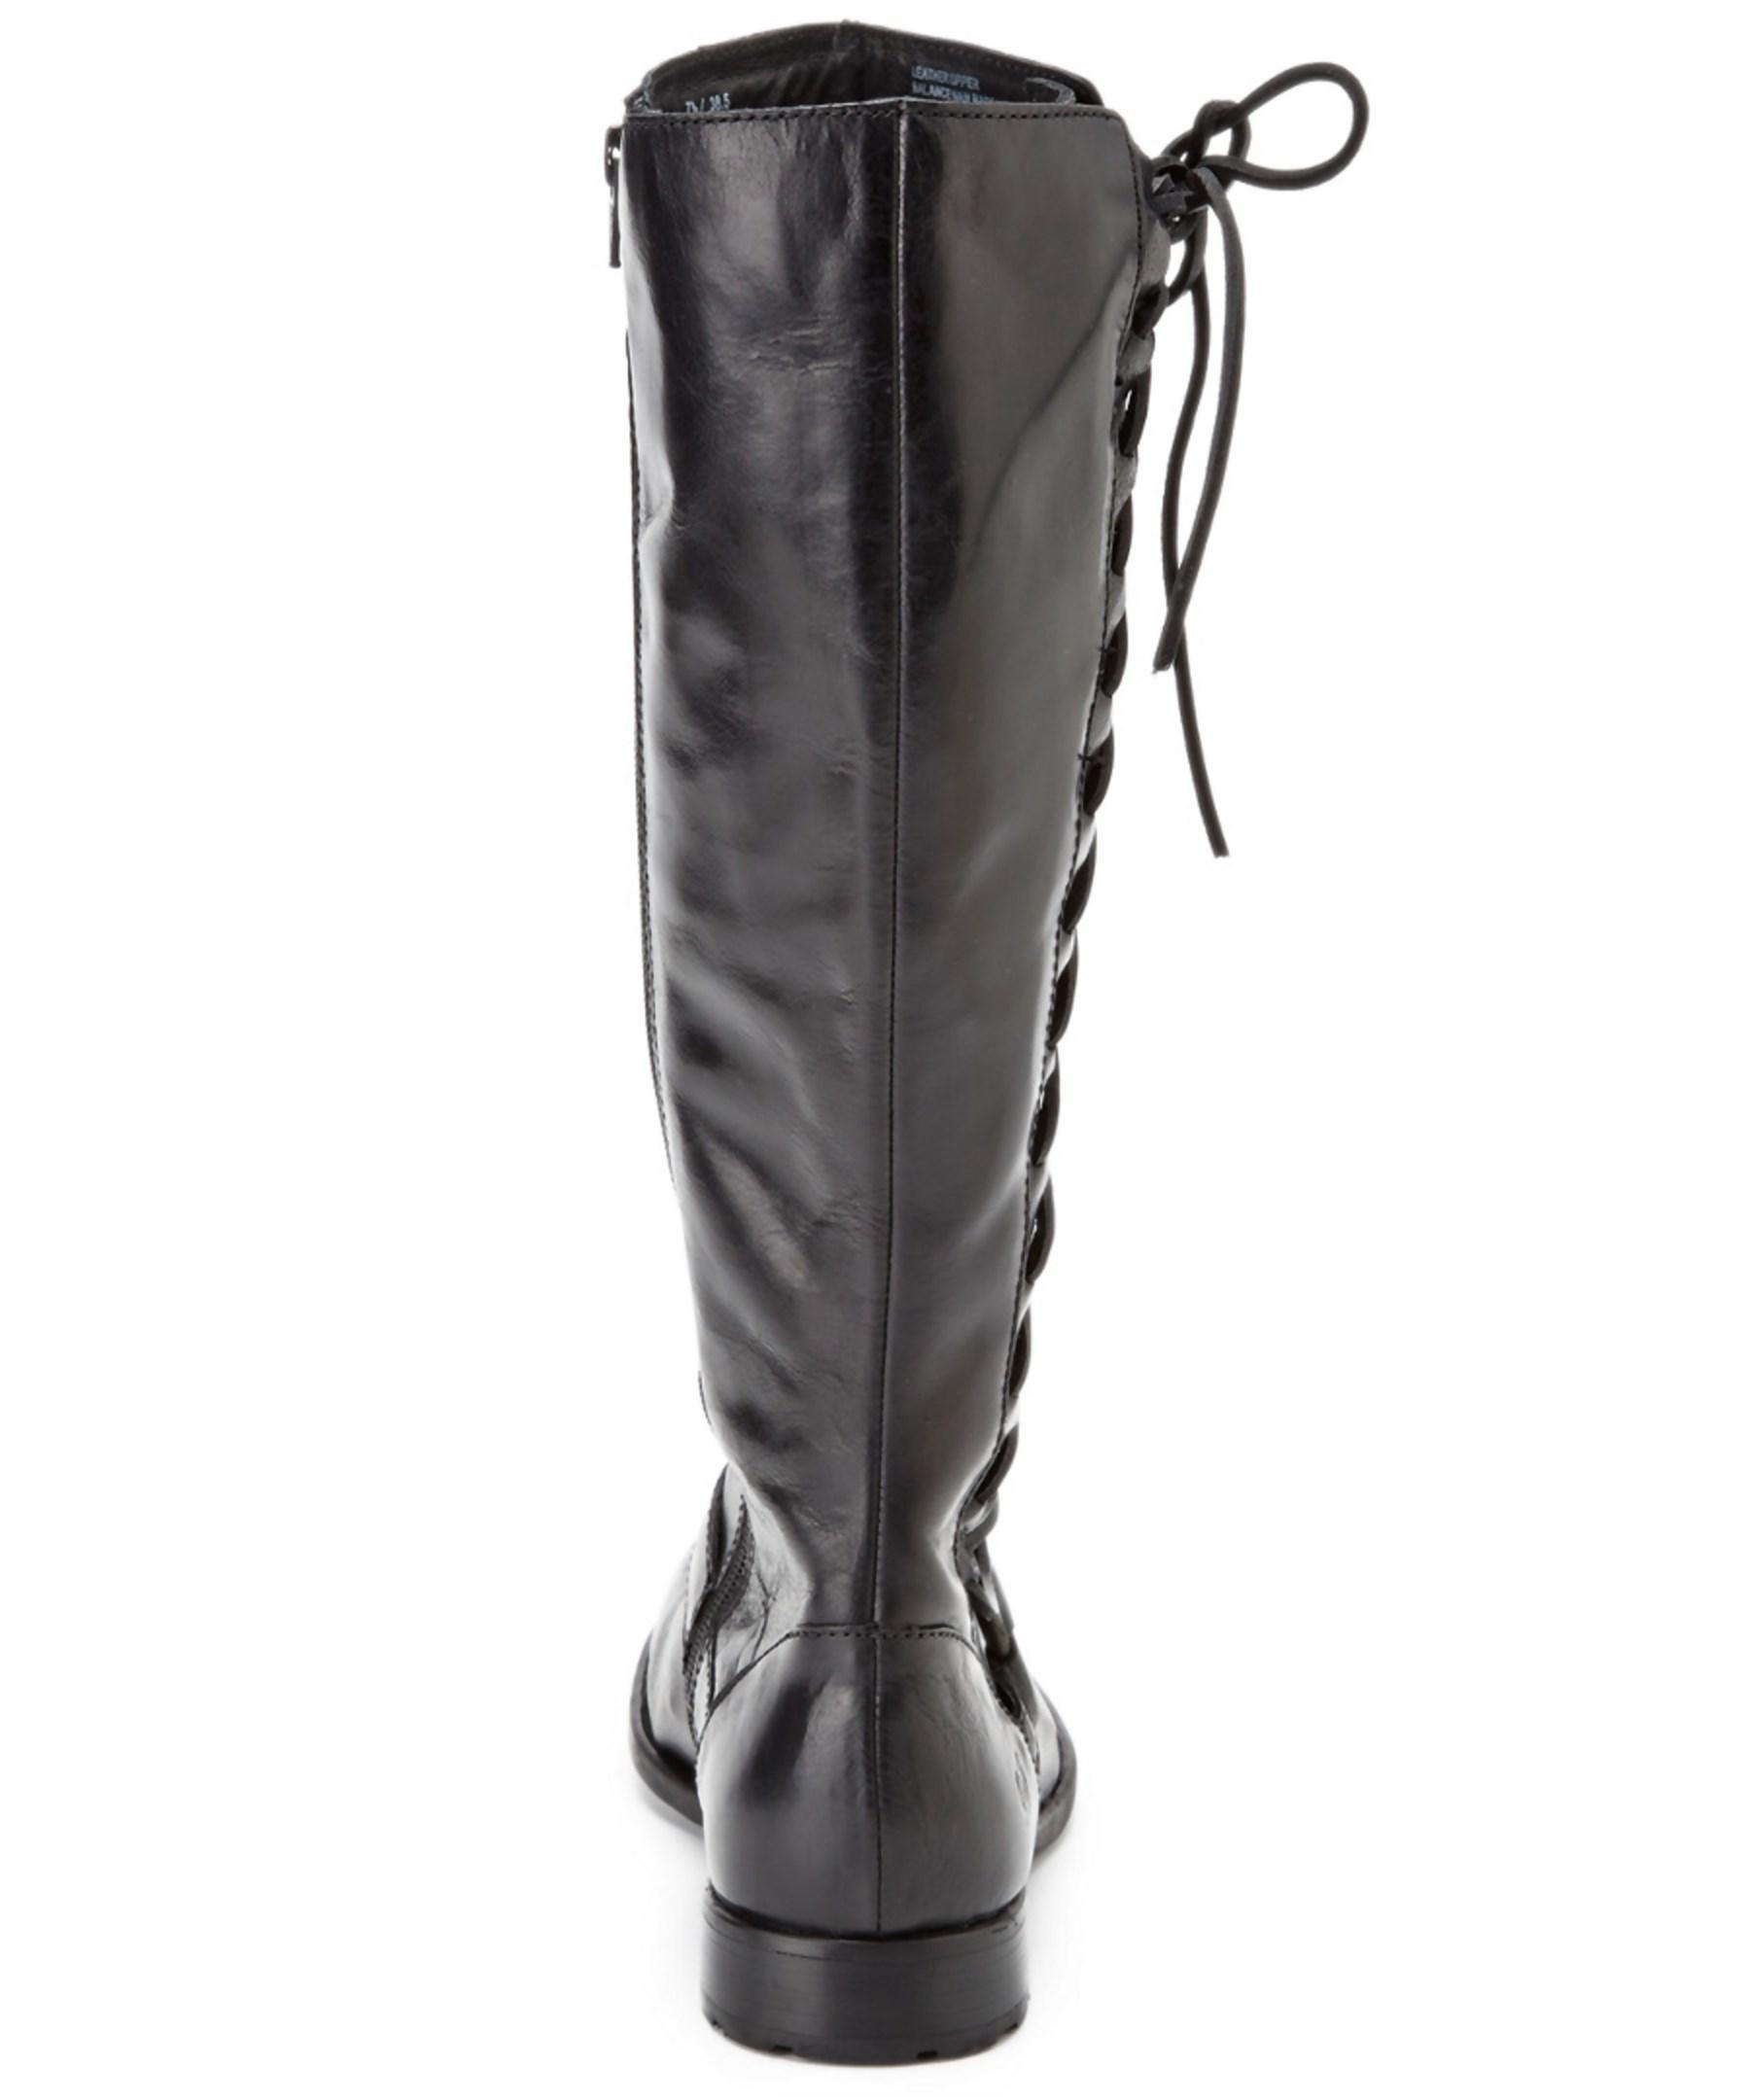 born estelle leather boot in black lyst